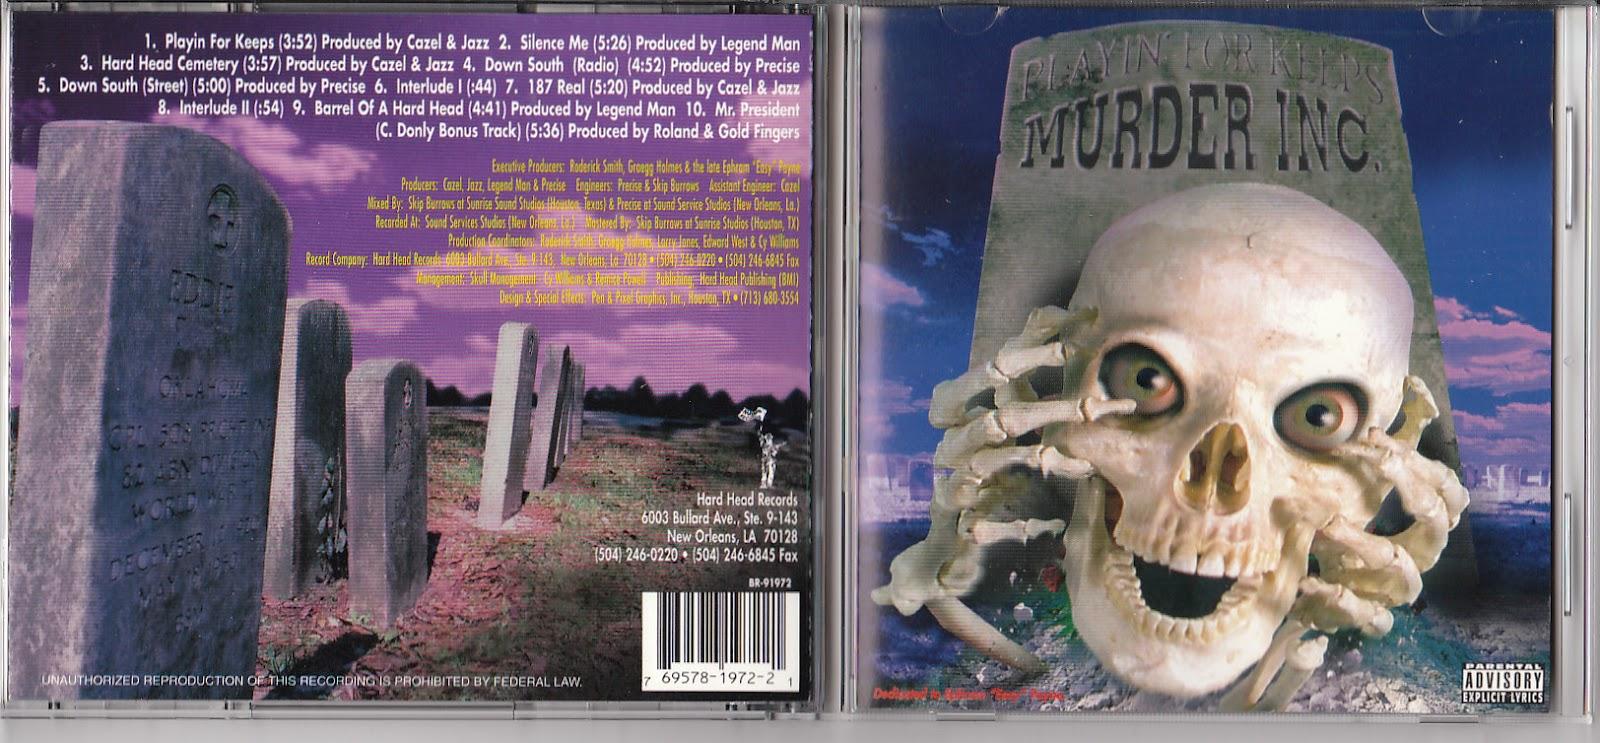 Dernier CD/VINYLE/DVD acheté ? - Page 38 Murder+Inc.+-+Playin+For+Keeps